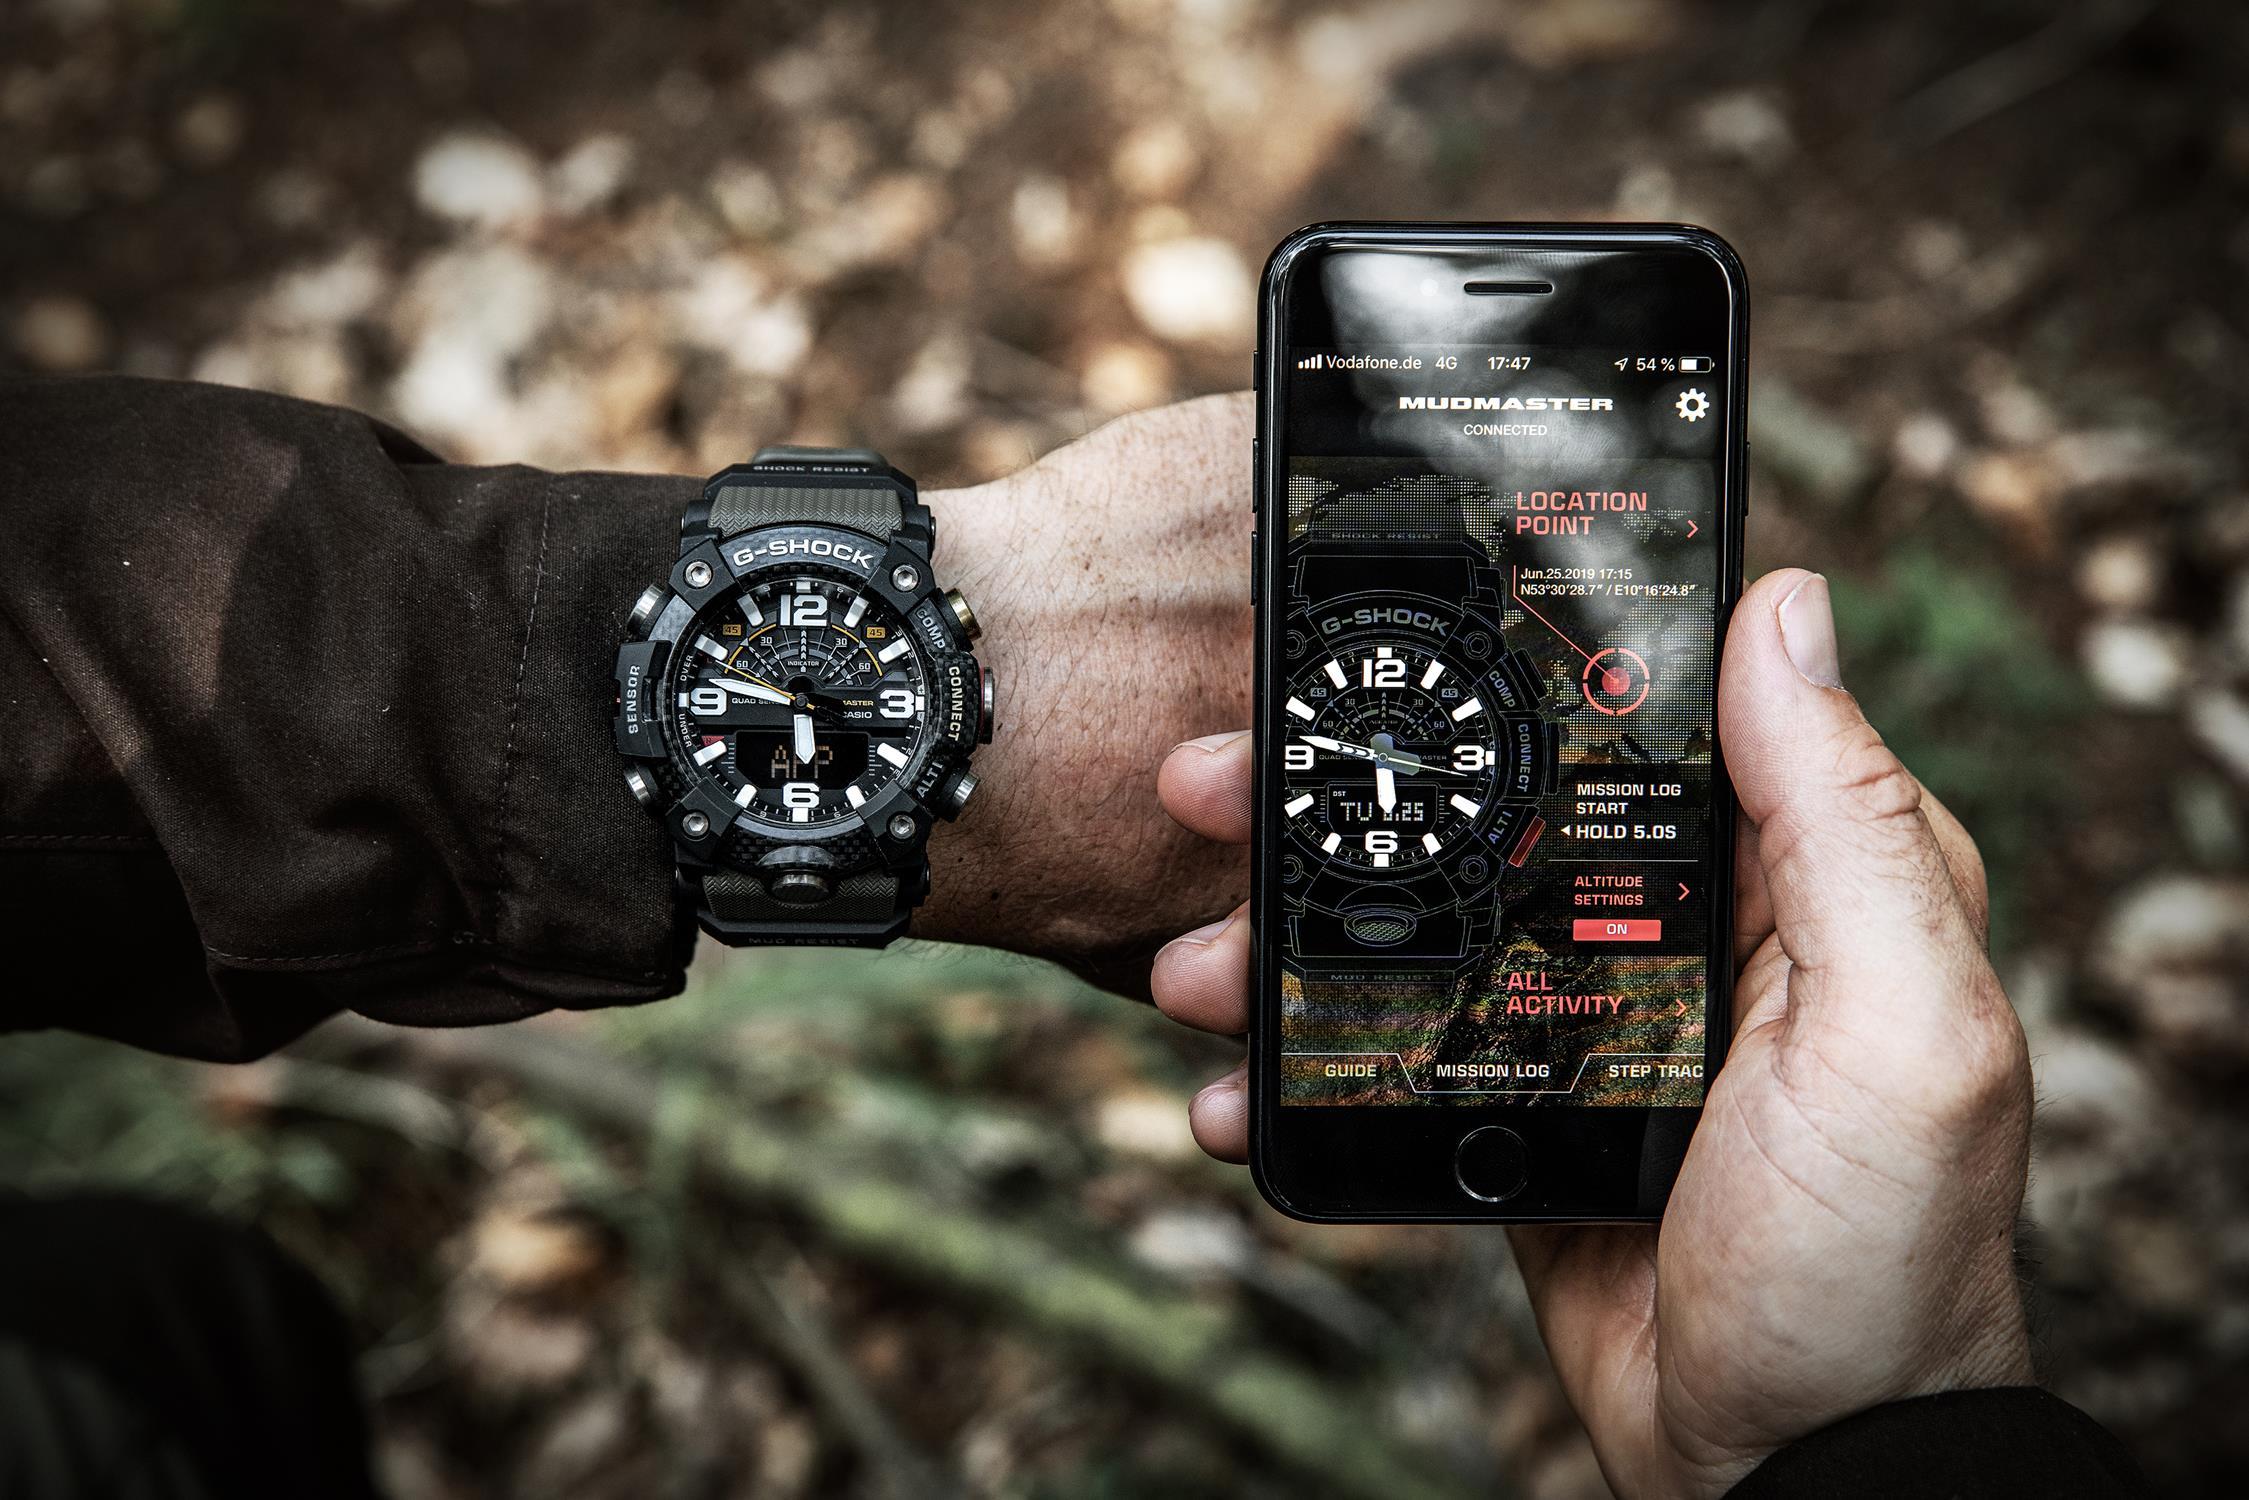 Niepowtarzalny zegarek G-Shock Mudmaster GG-B100-1A3ER